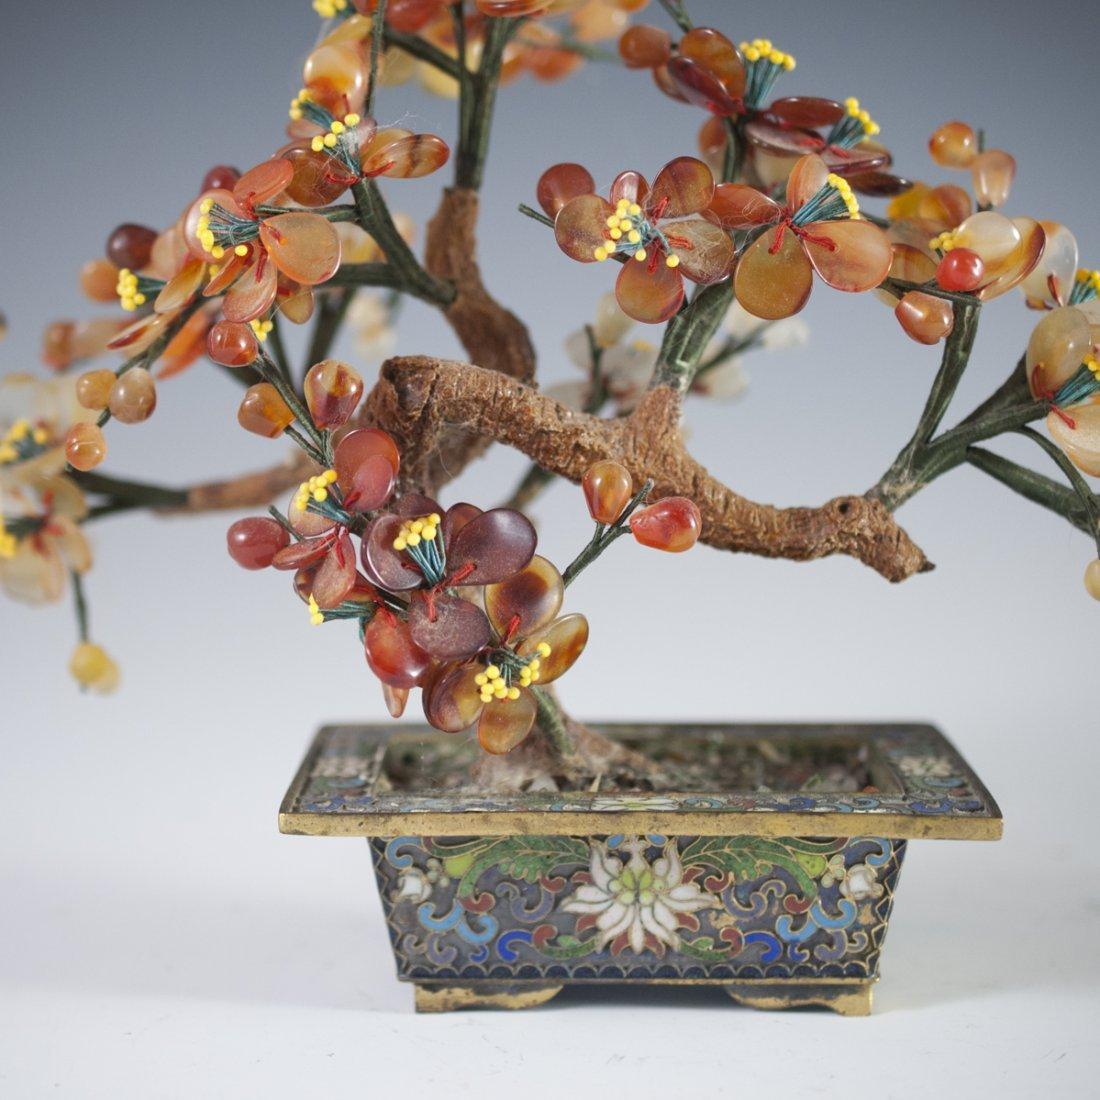 Chinese Enameled Cloissone Agate Bonsai Trees - 3